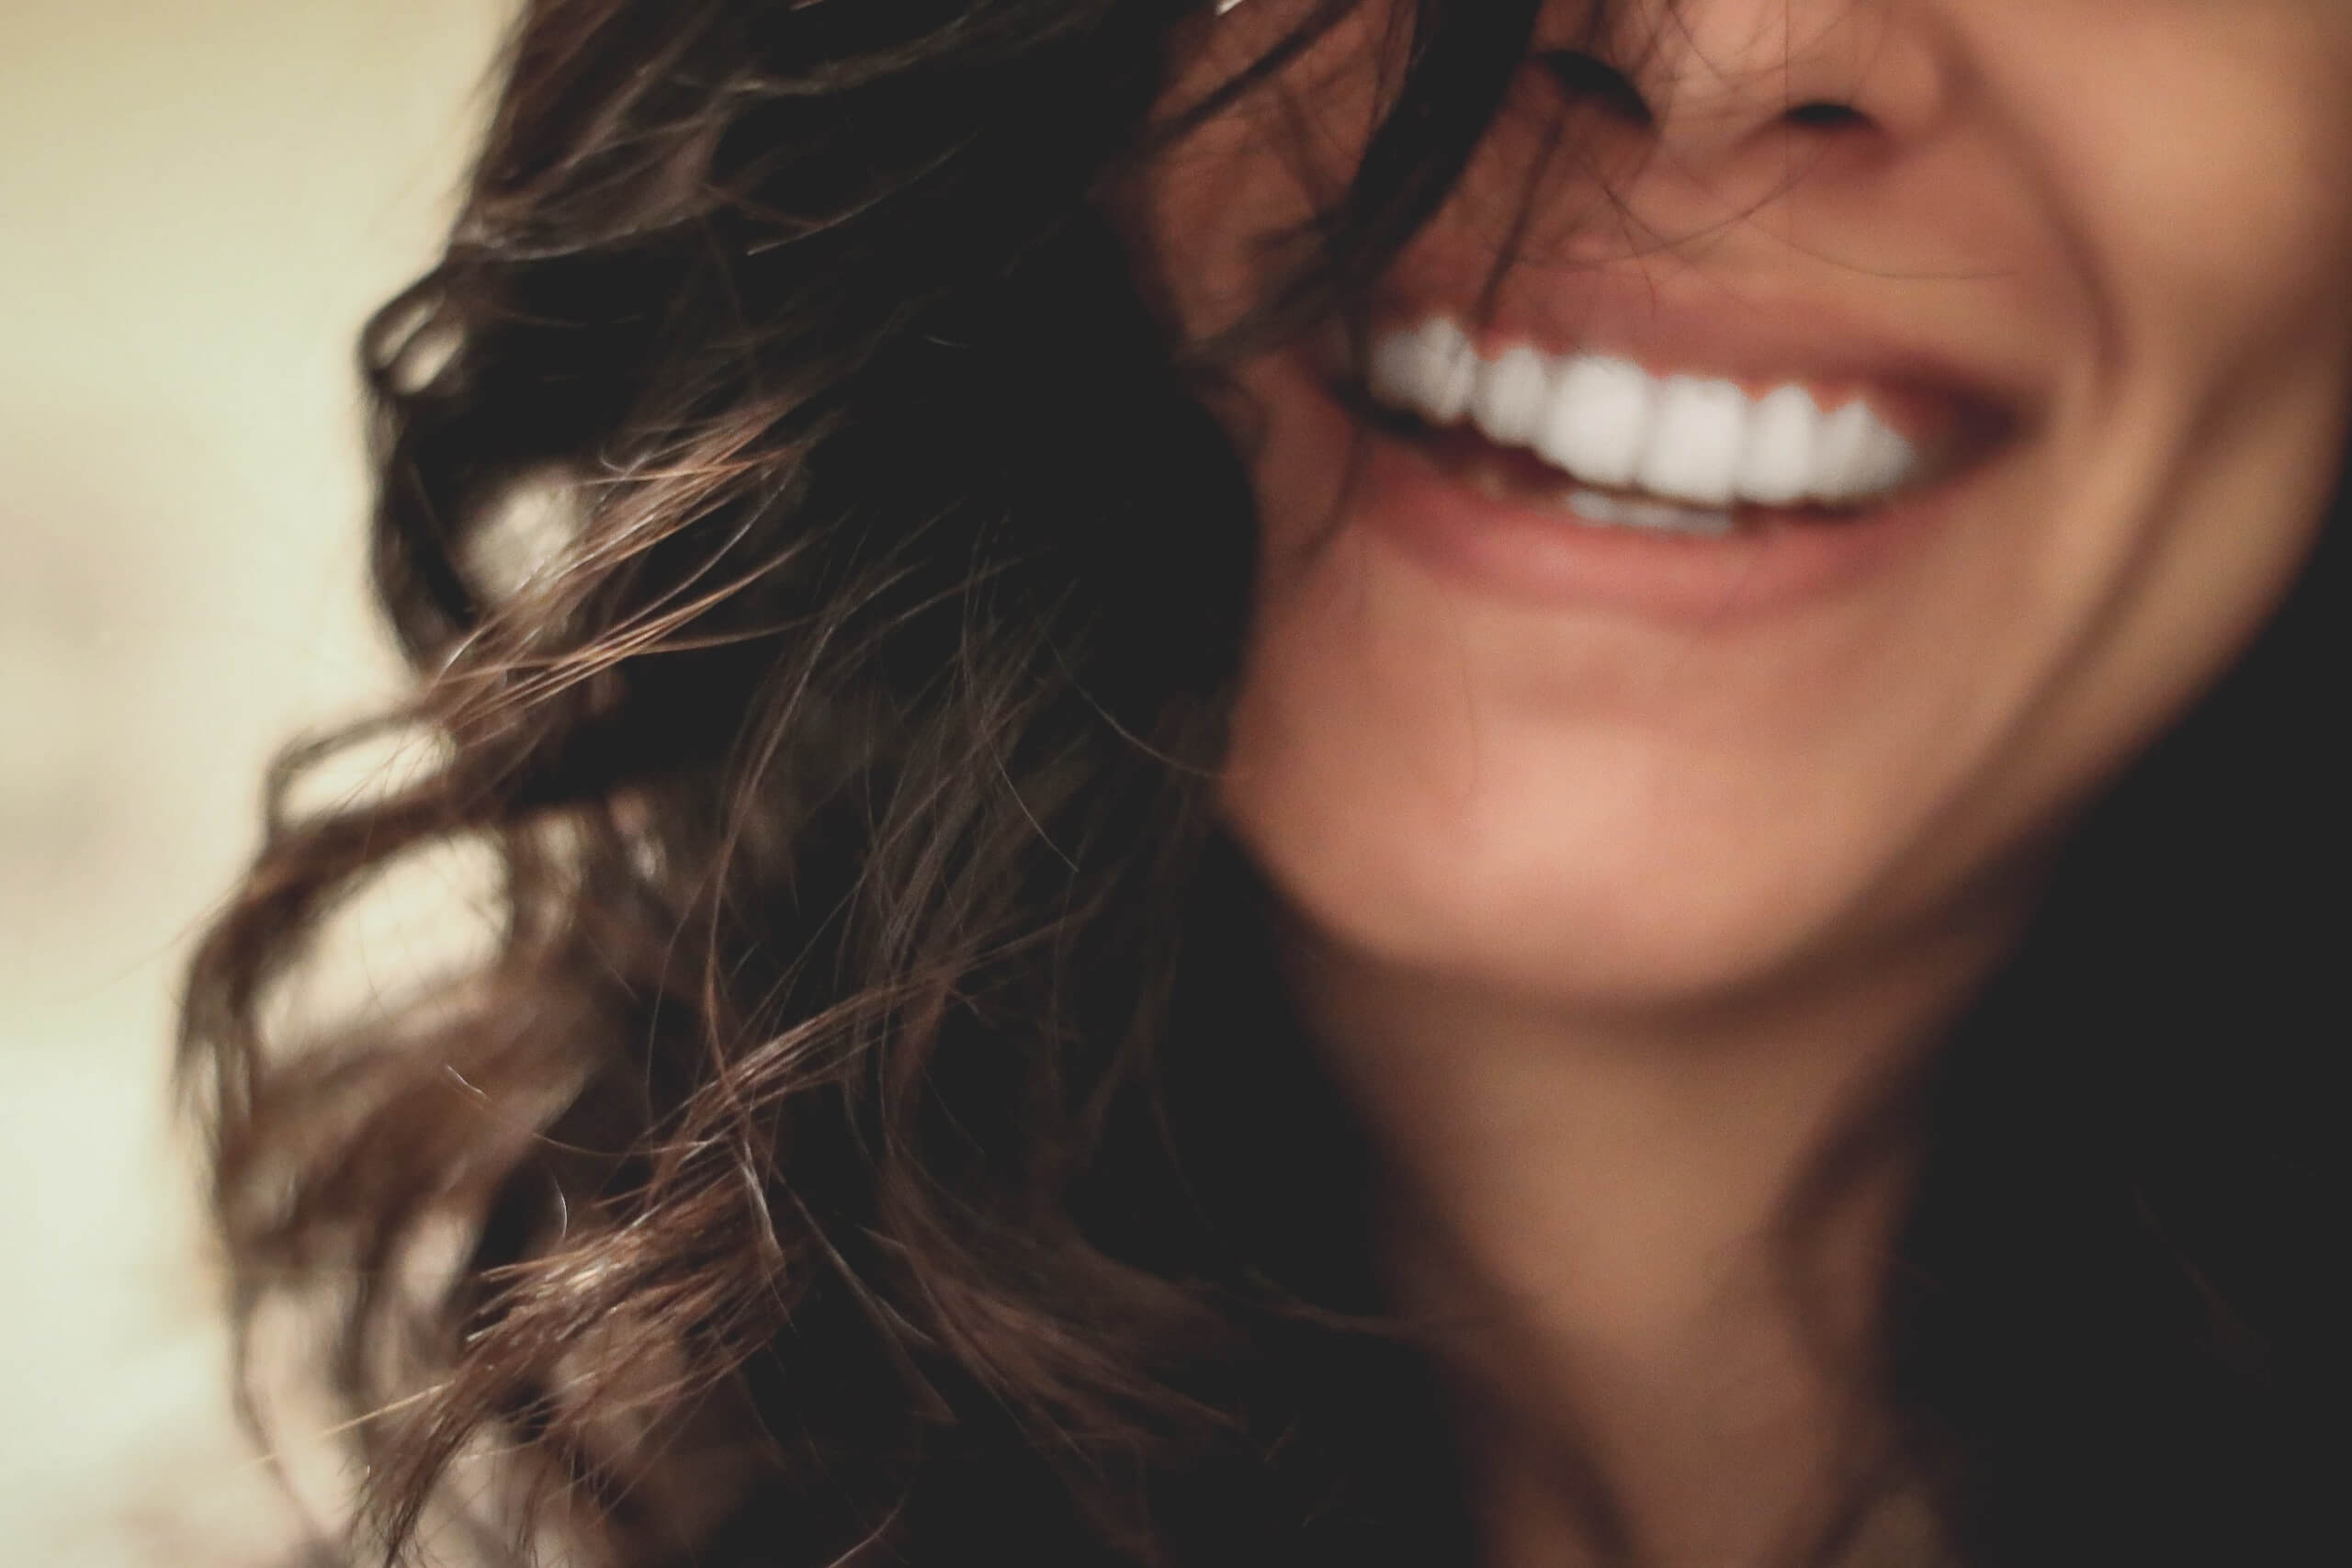 5 Best Ways to Treat Tooth Sensitivity